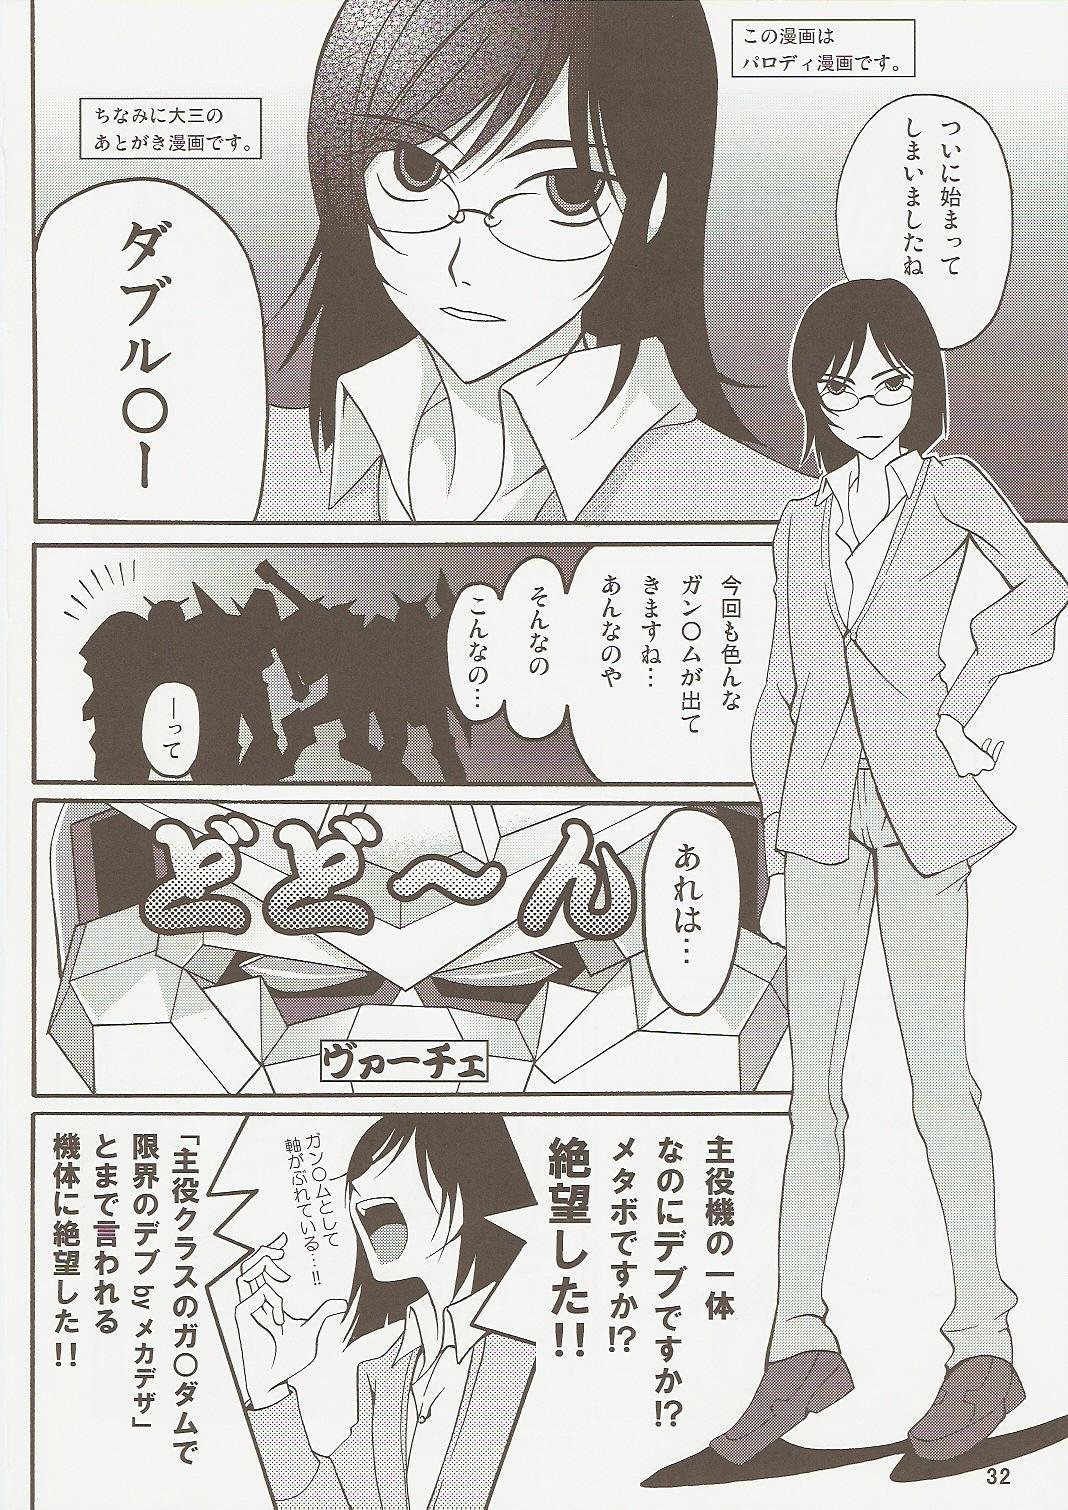 COMIC Daybreak Vol. 01 30